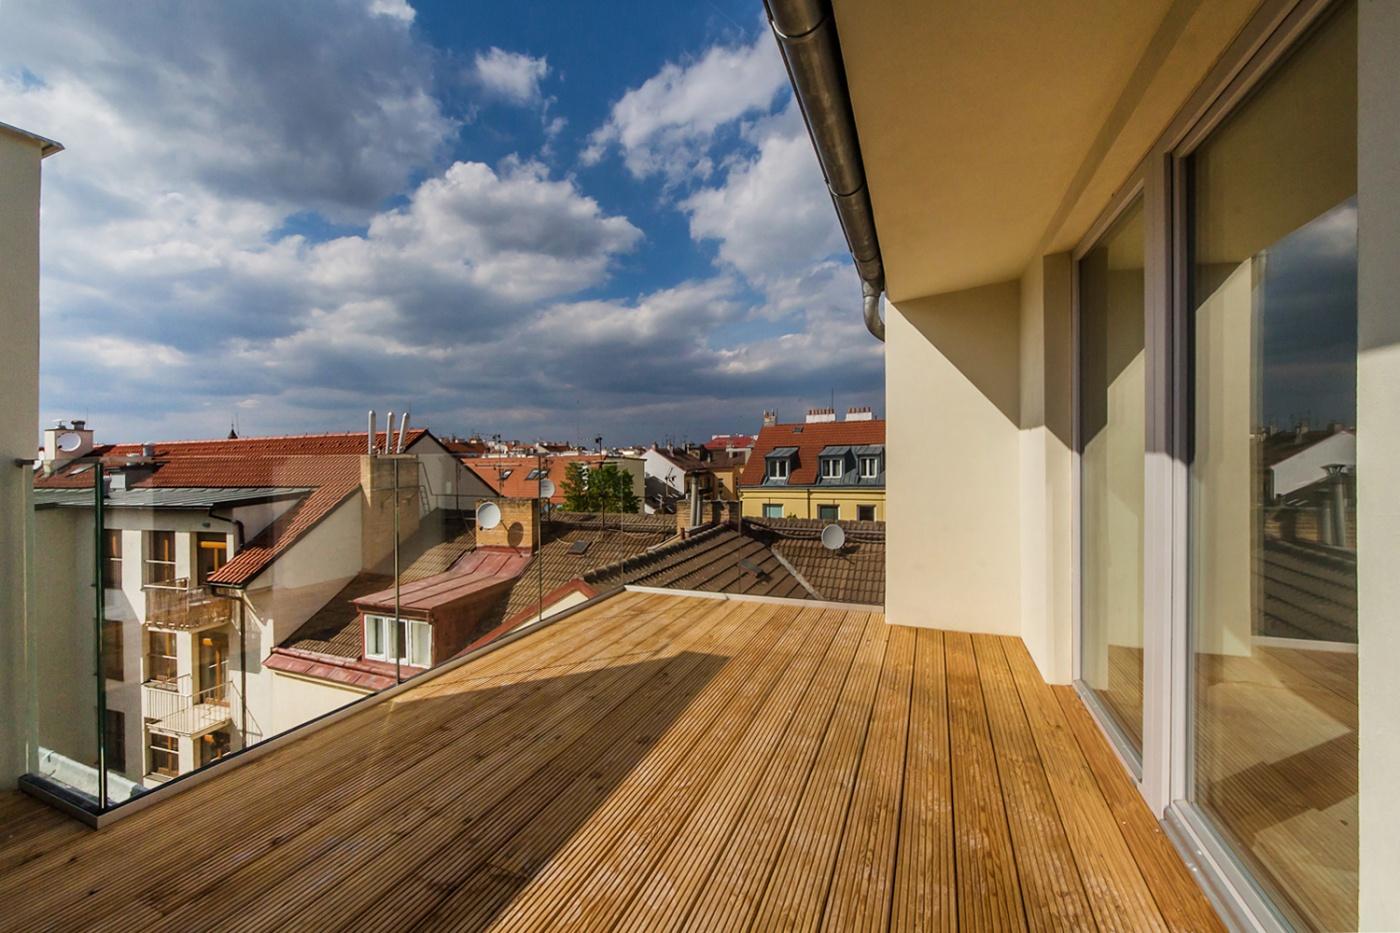 Půdní byt 4+kk, plocha 130 m², ulice Wenzigova, Praha 2 - Vinohrady | 1